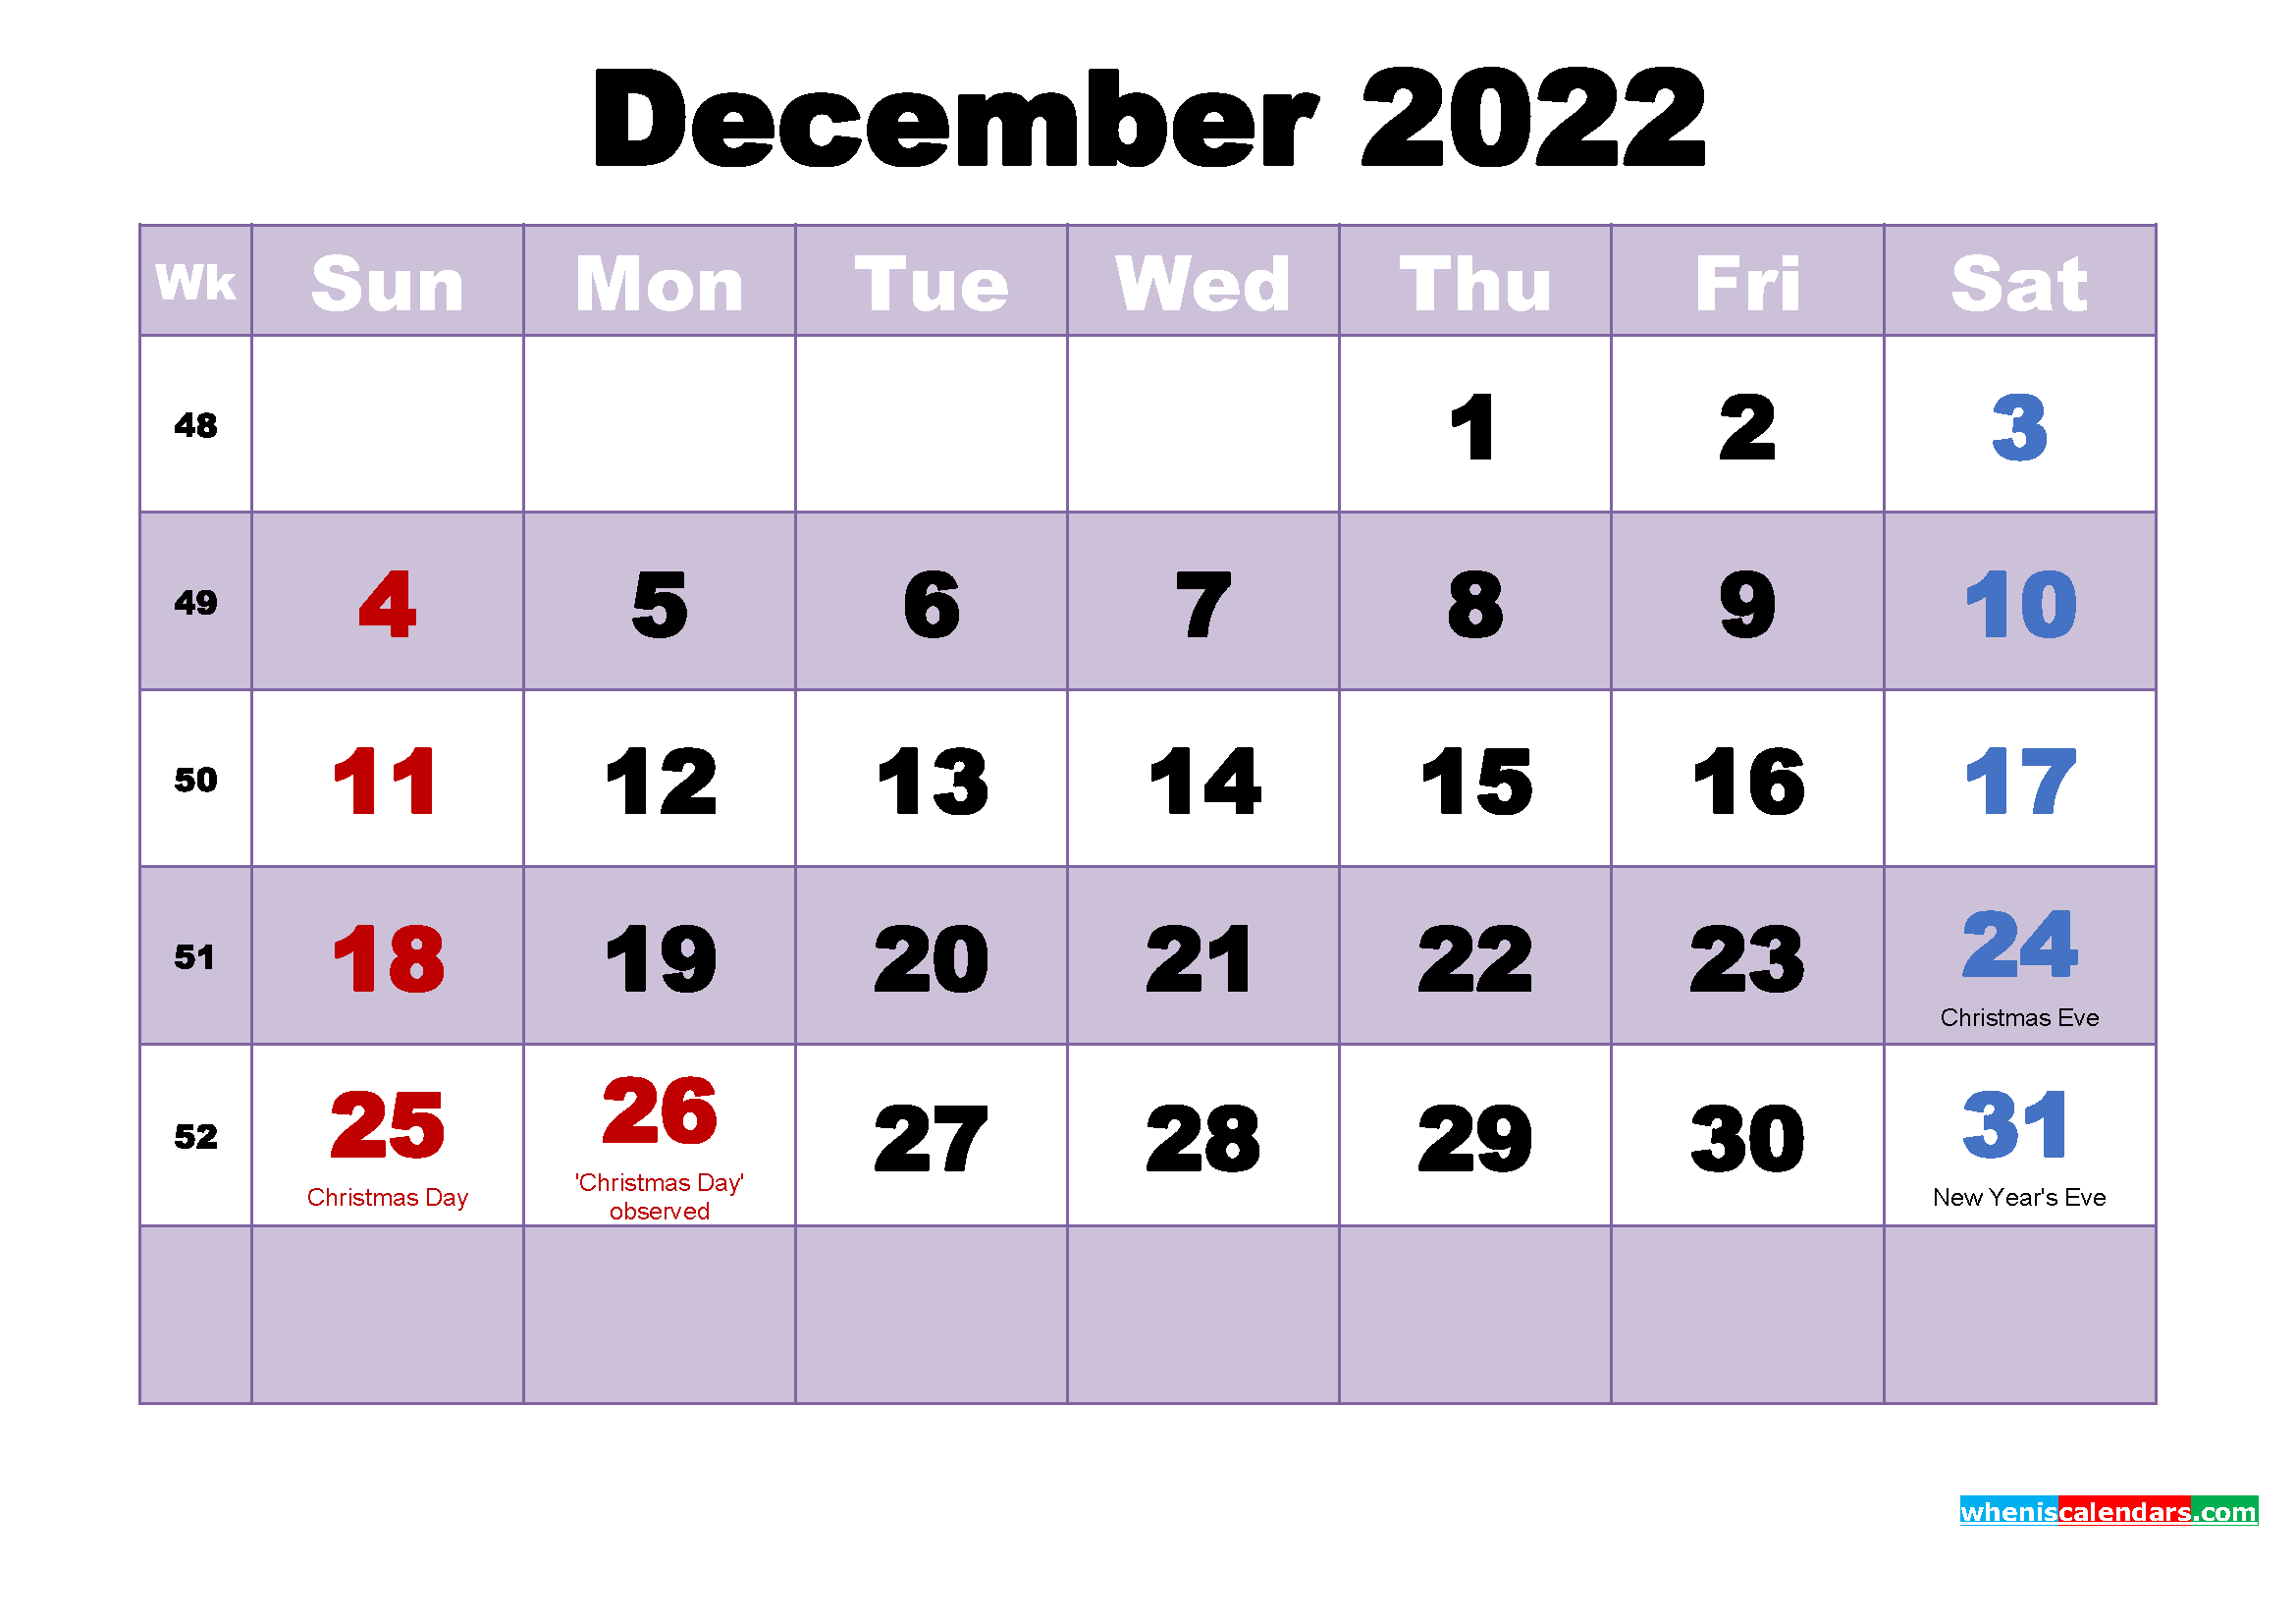 Printable December 2022 Calendar Word.Free Printable December 2022 Calendar Word Free Printable 2021 Monthly Calendar With Holidays